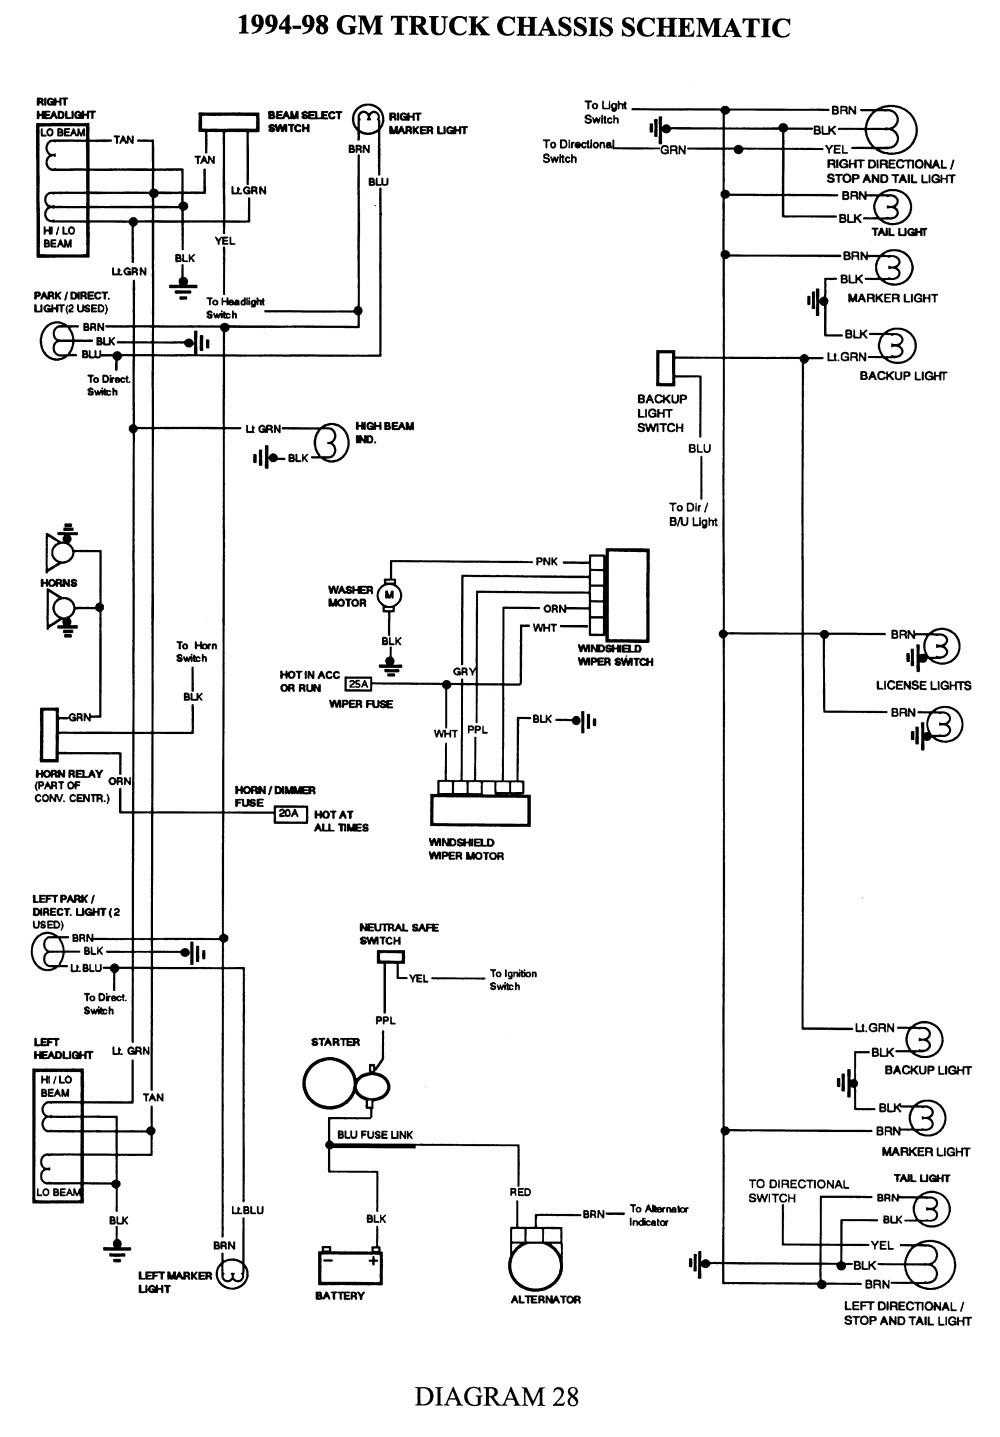 2005 Chevy Silverado Wiring Diagram Inspirational Gm Trailer Wiring Wiring Diagram for 2006 Chevy Silverado